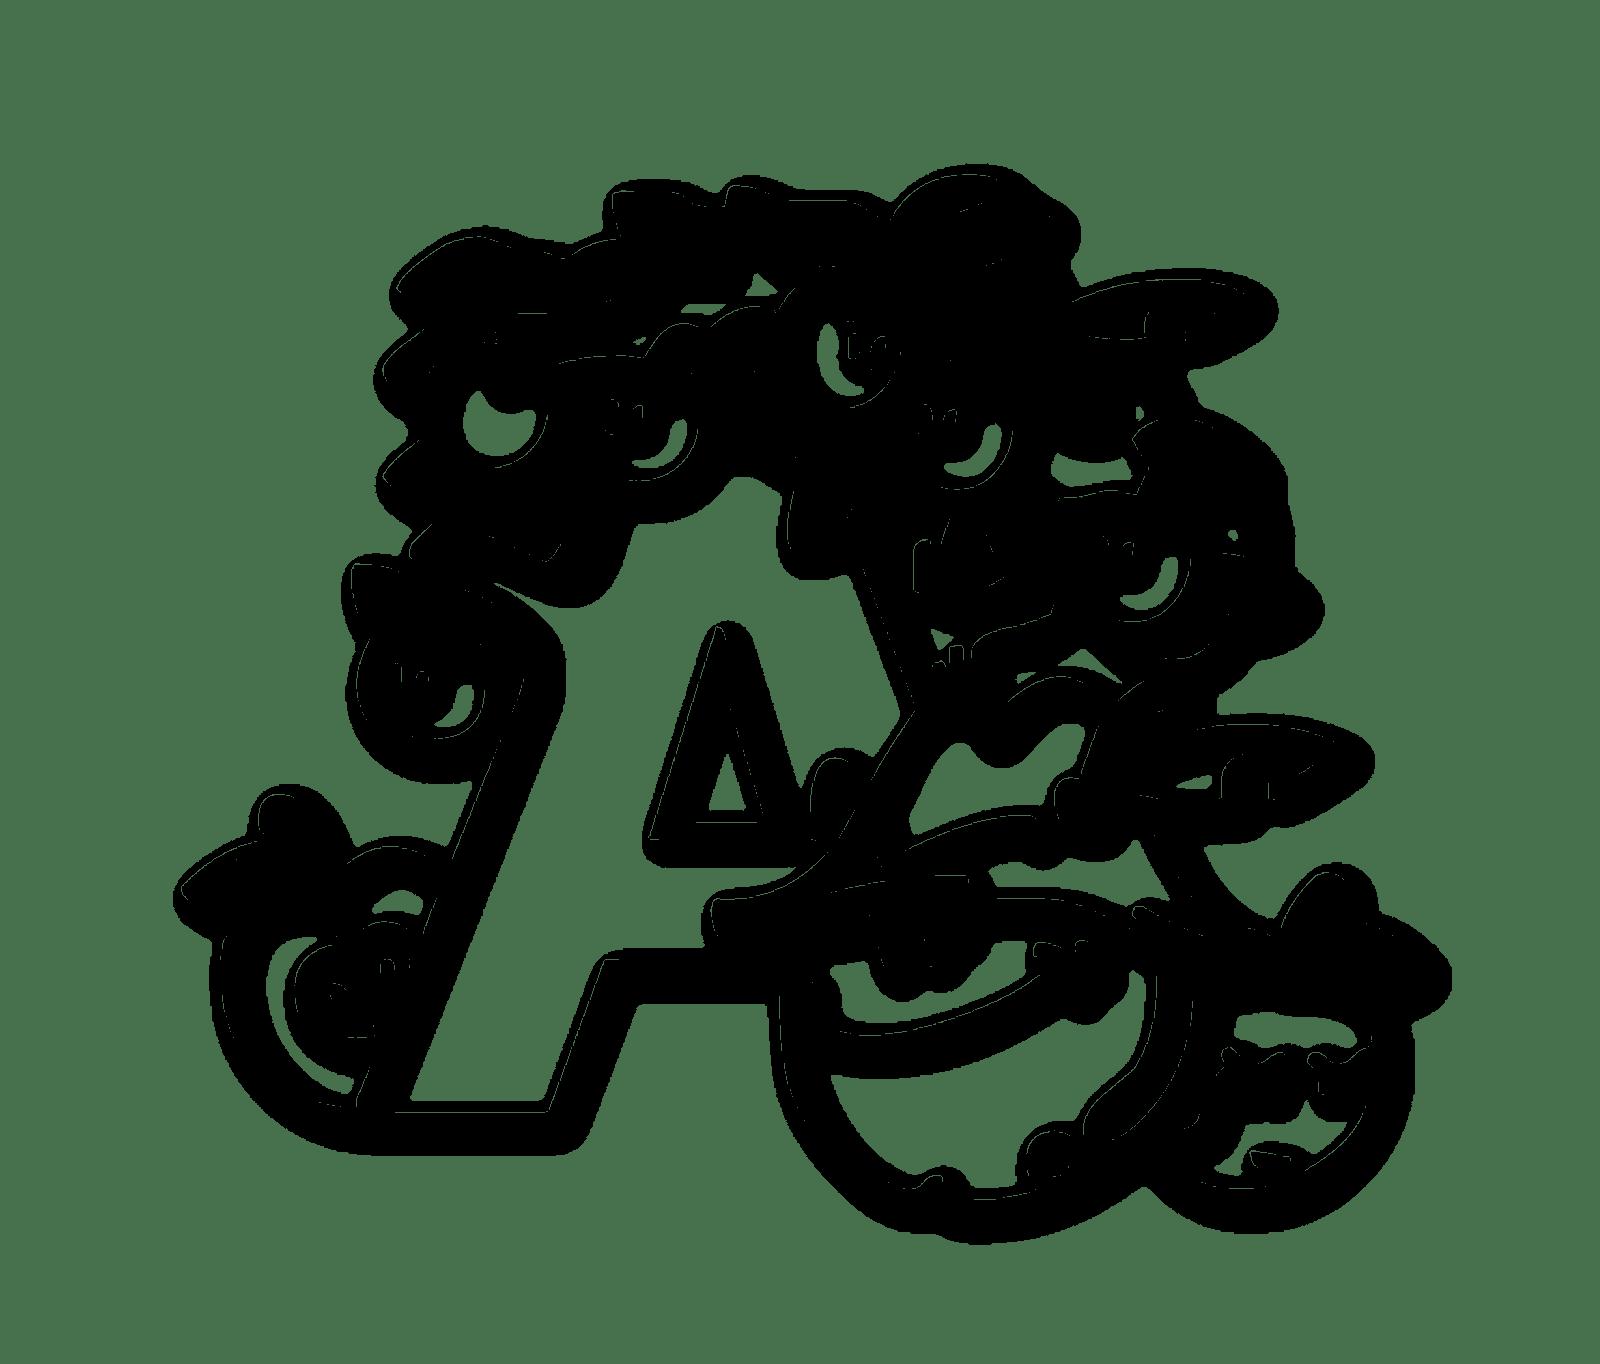 Alphabets Phonetics Clipart